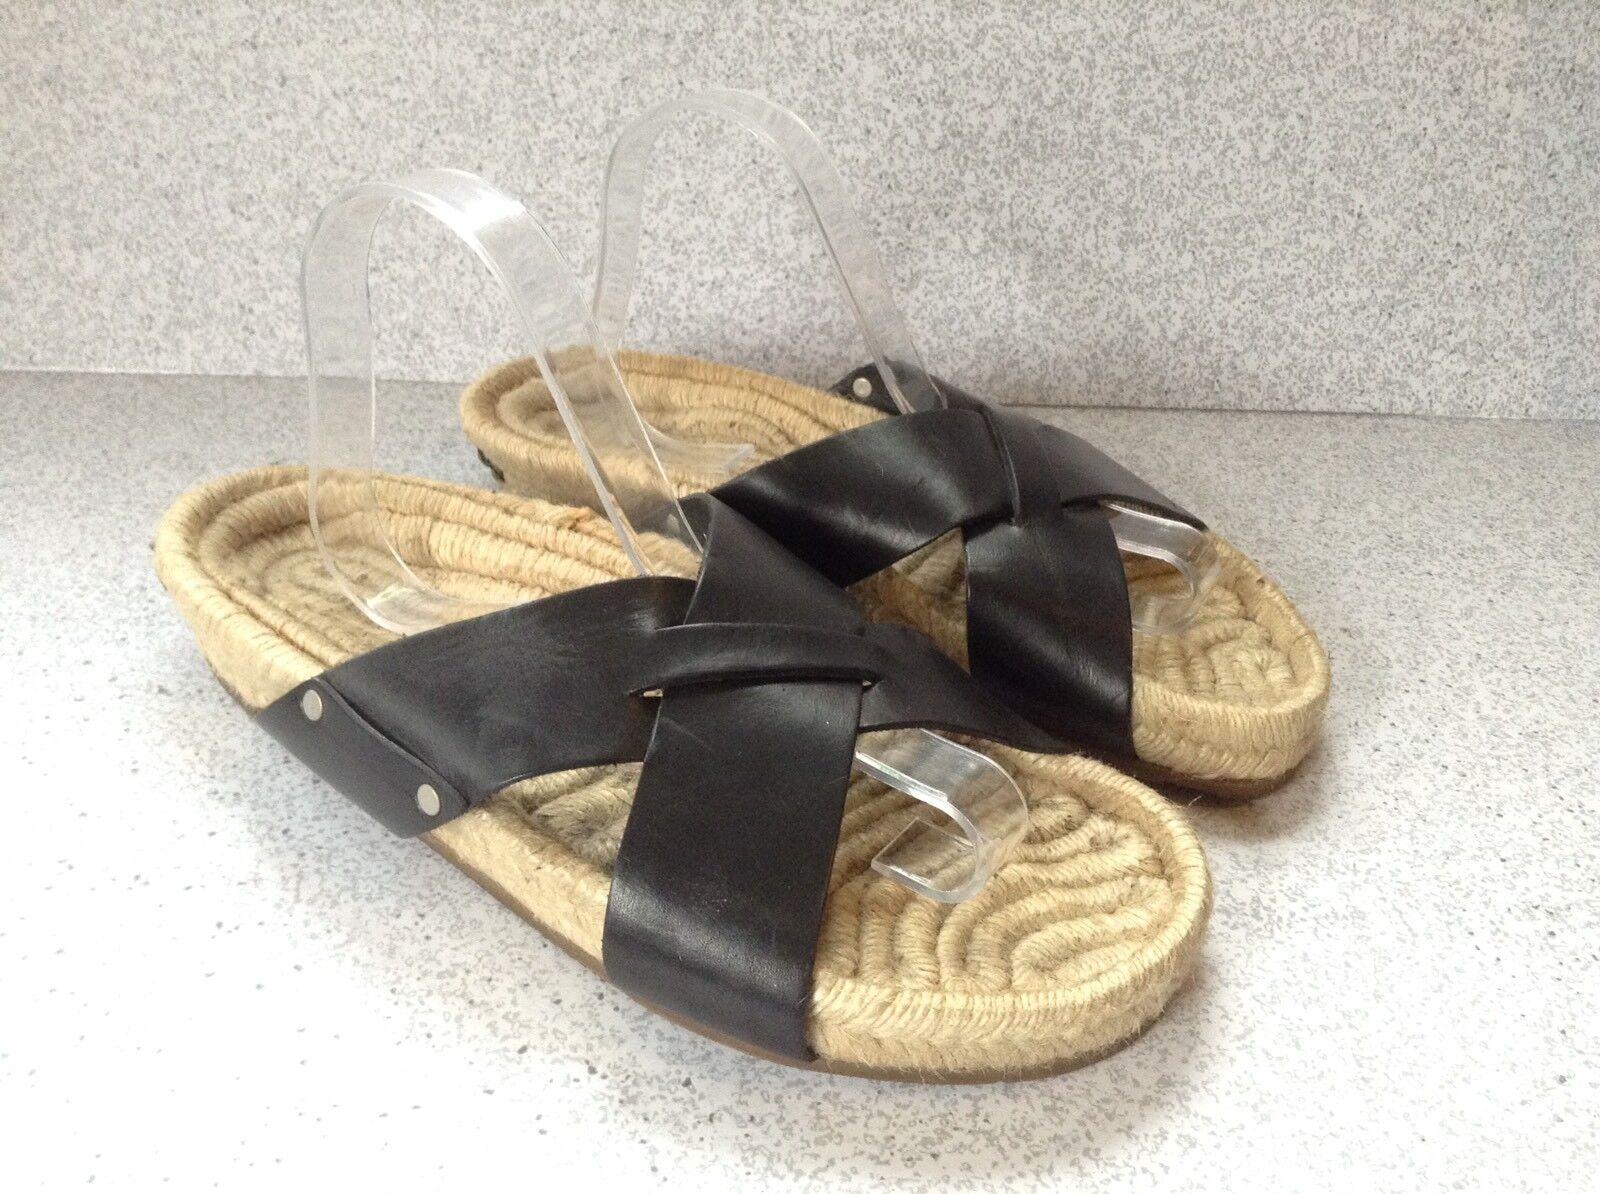 Ralph Lauren Black Label Women's Sandals Sze 10M Woven Woven Woven Straw Black Leather  f1f367